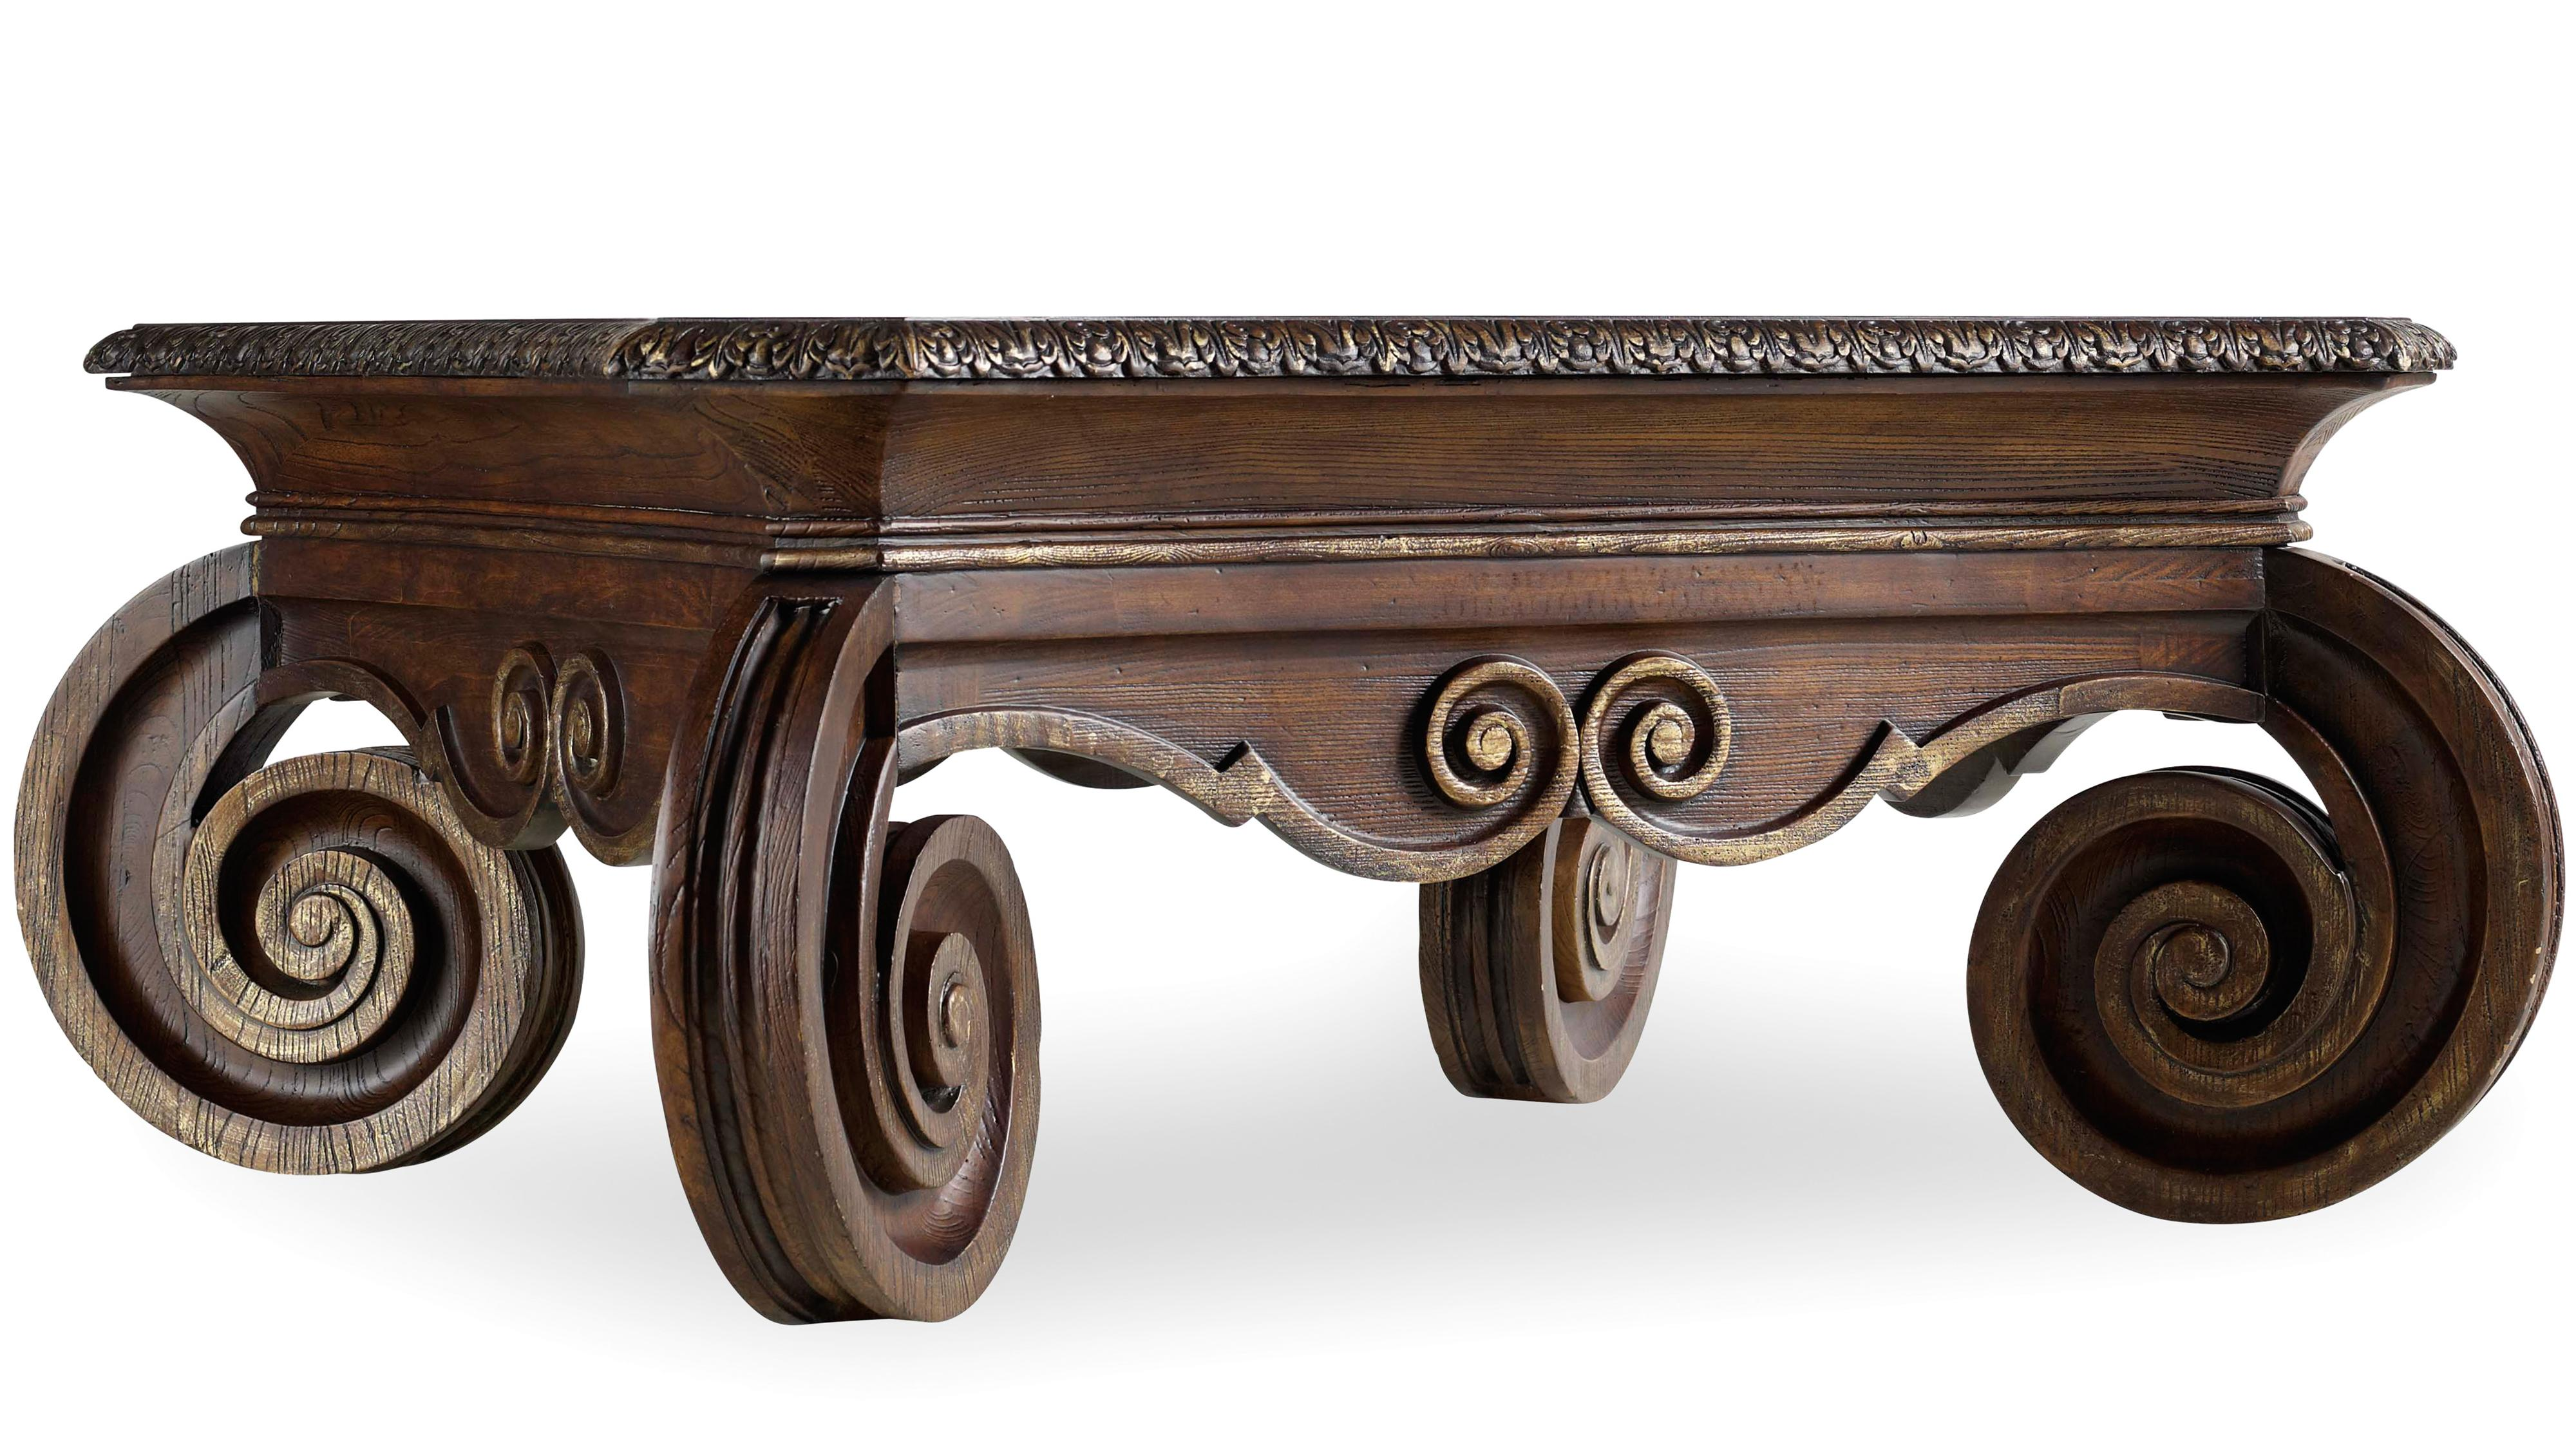 Hooker Furniture Adagio Square Cocktail Table - Item Number: 5091-80112